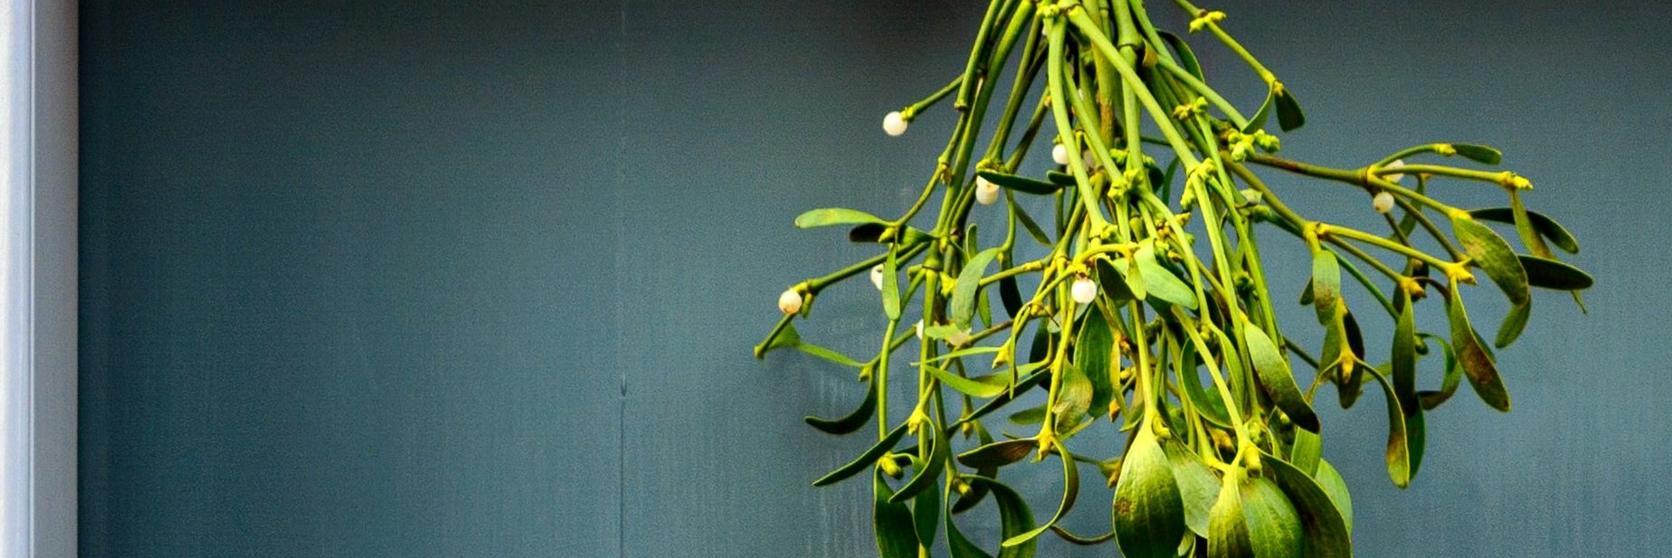 mistletoe-hanging-cropped